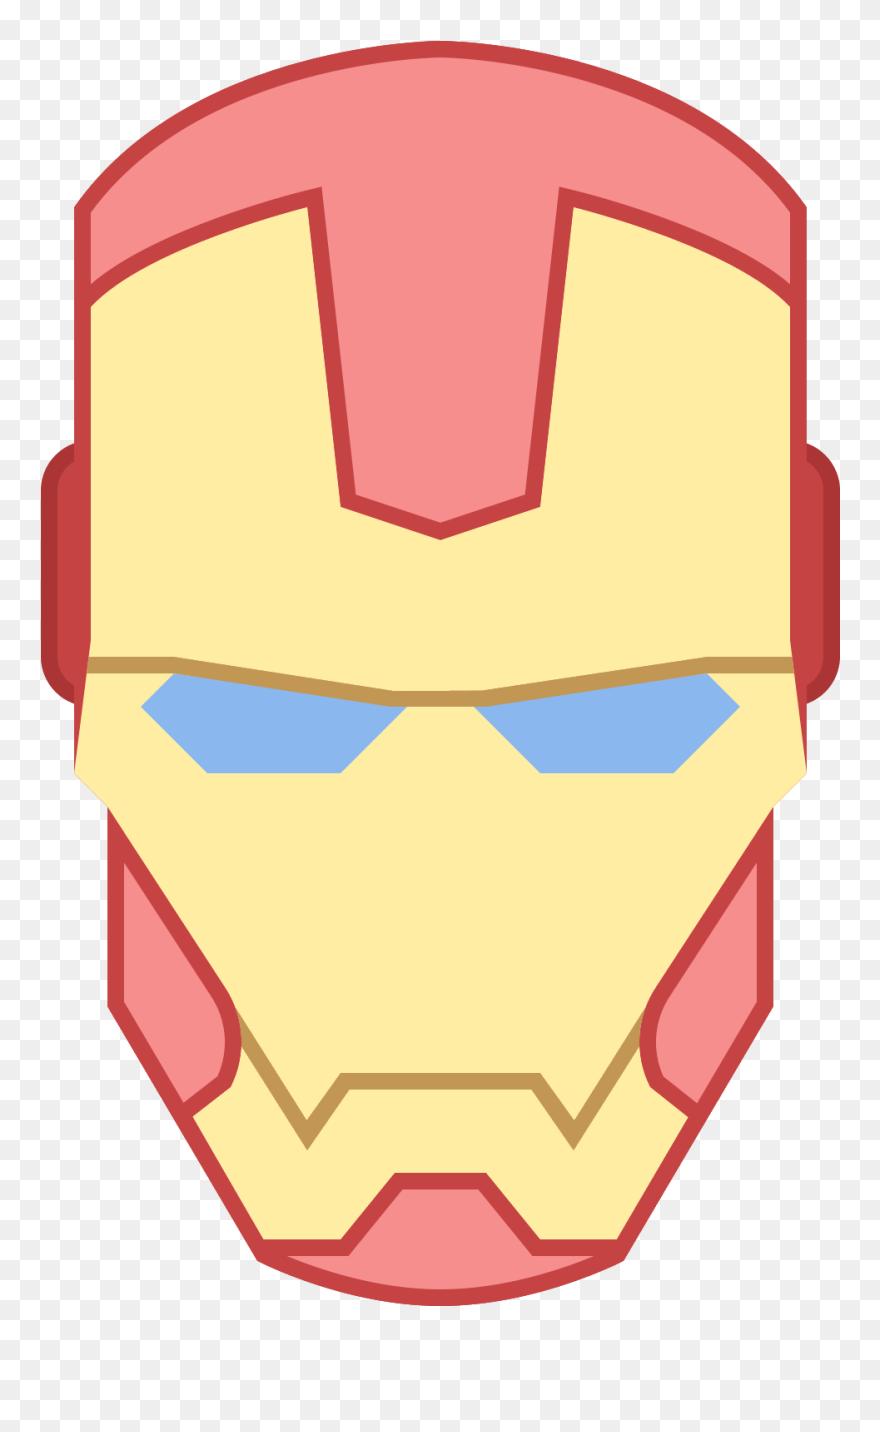 Masks Clipart Ironman Iron Man Face Clipart Png Download 5671760 Pinclipart